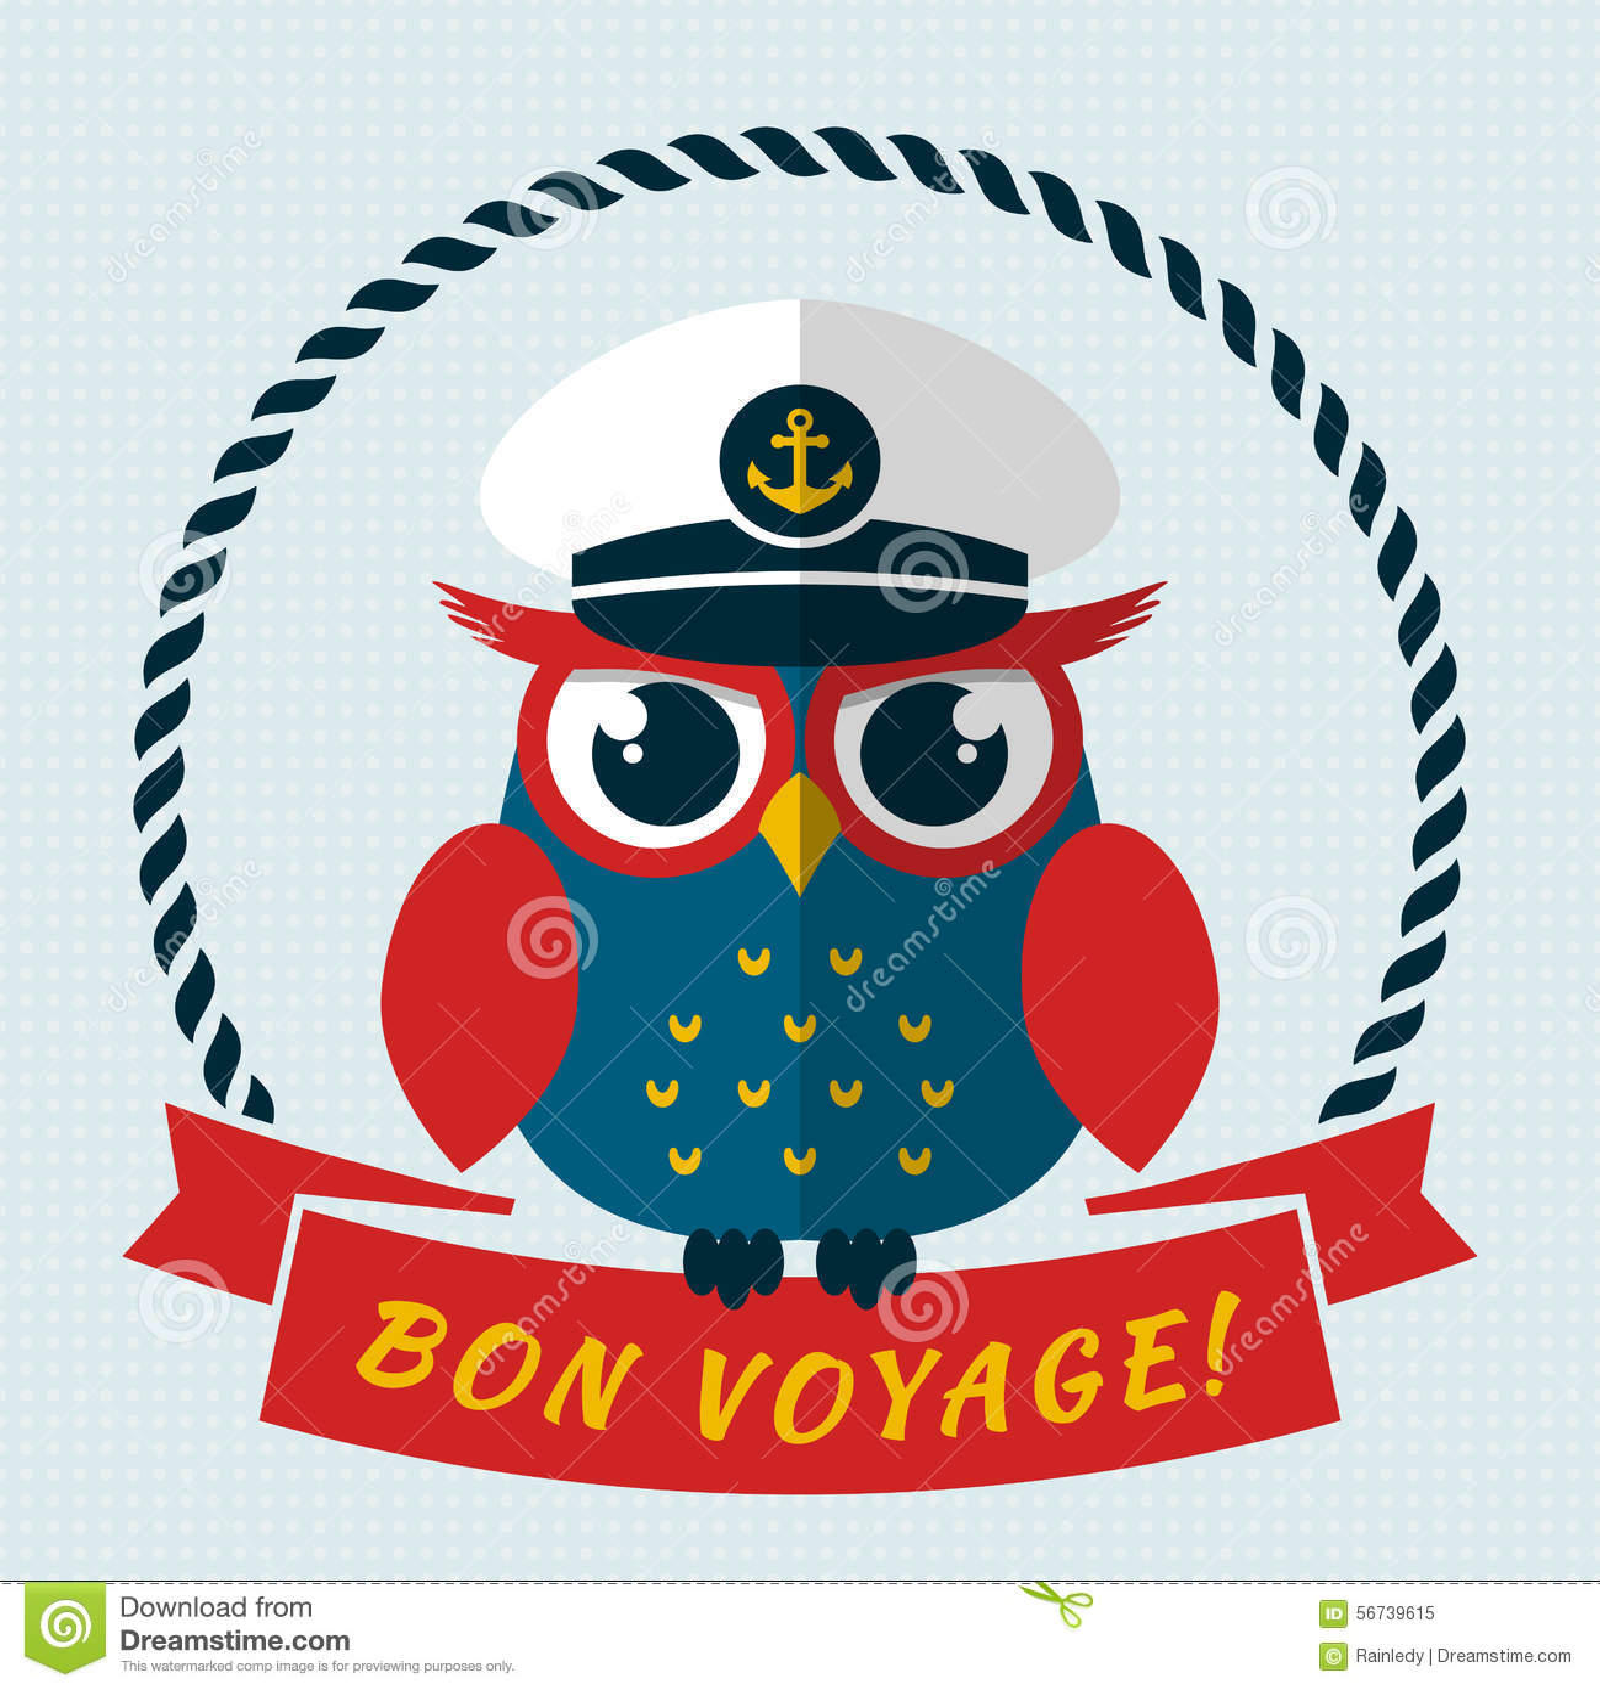 Bon Voyage! Vector Card With Owl. Stock Vector ...